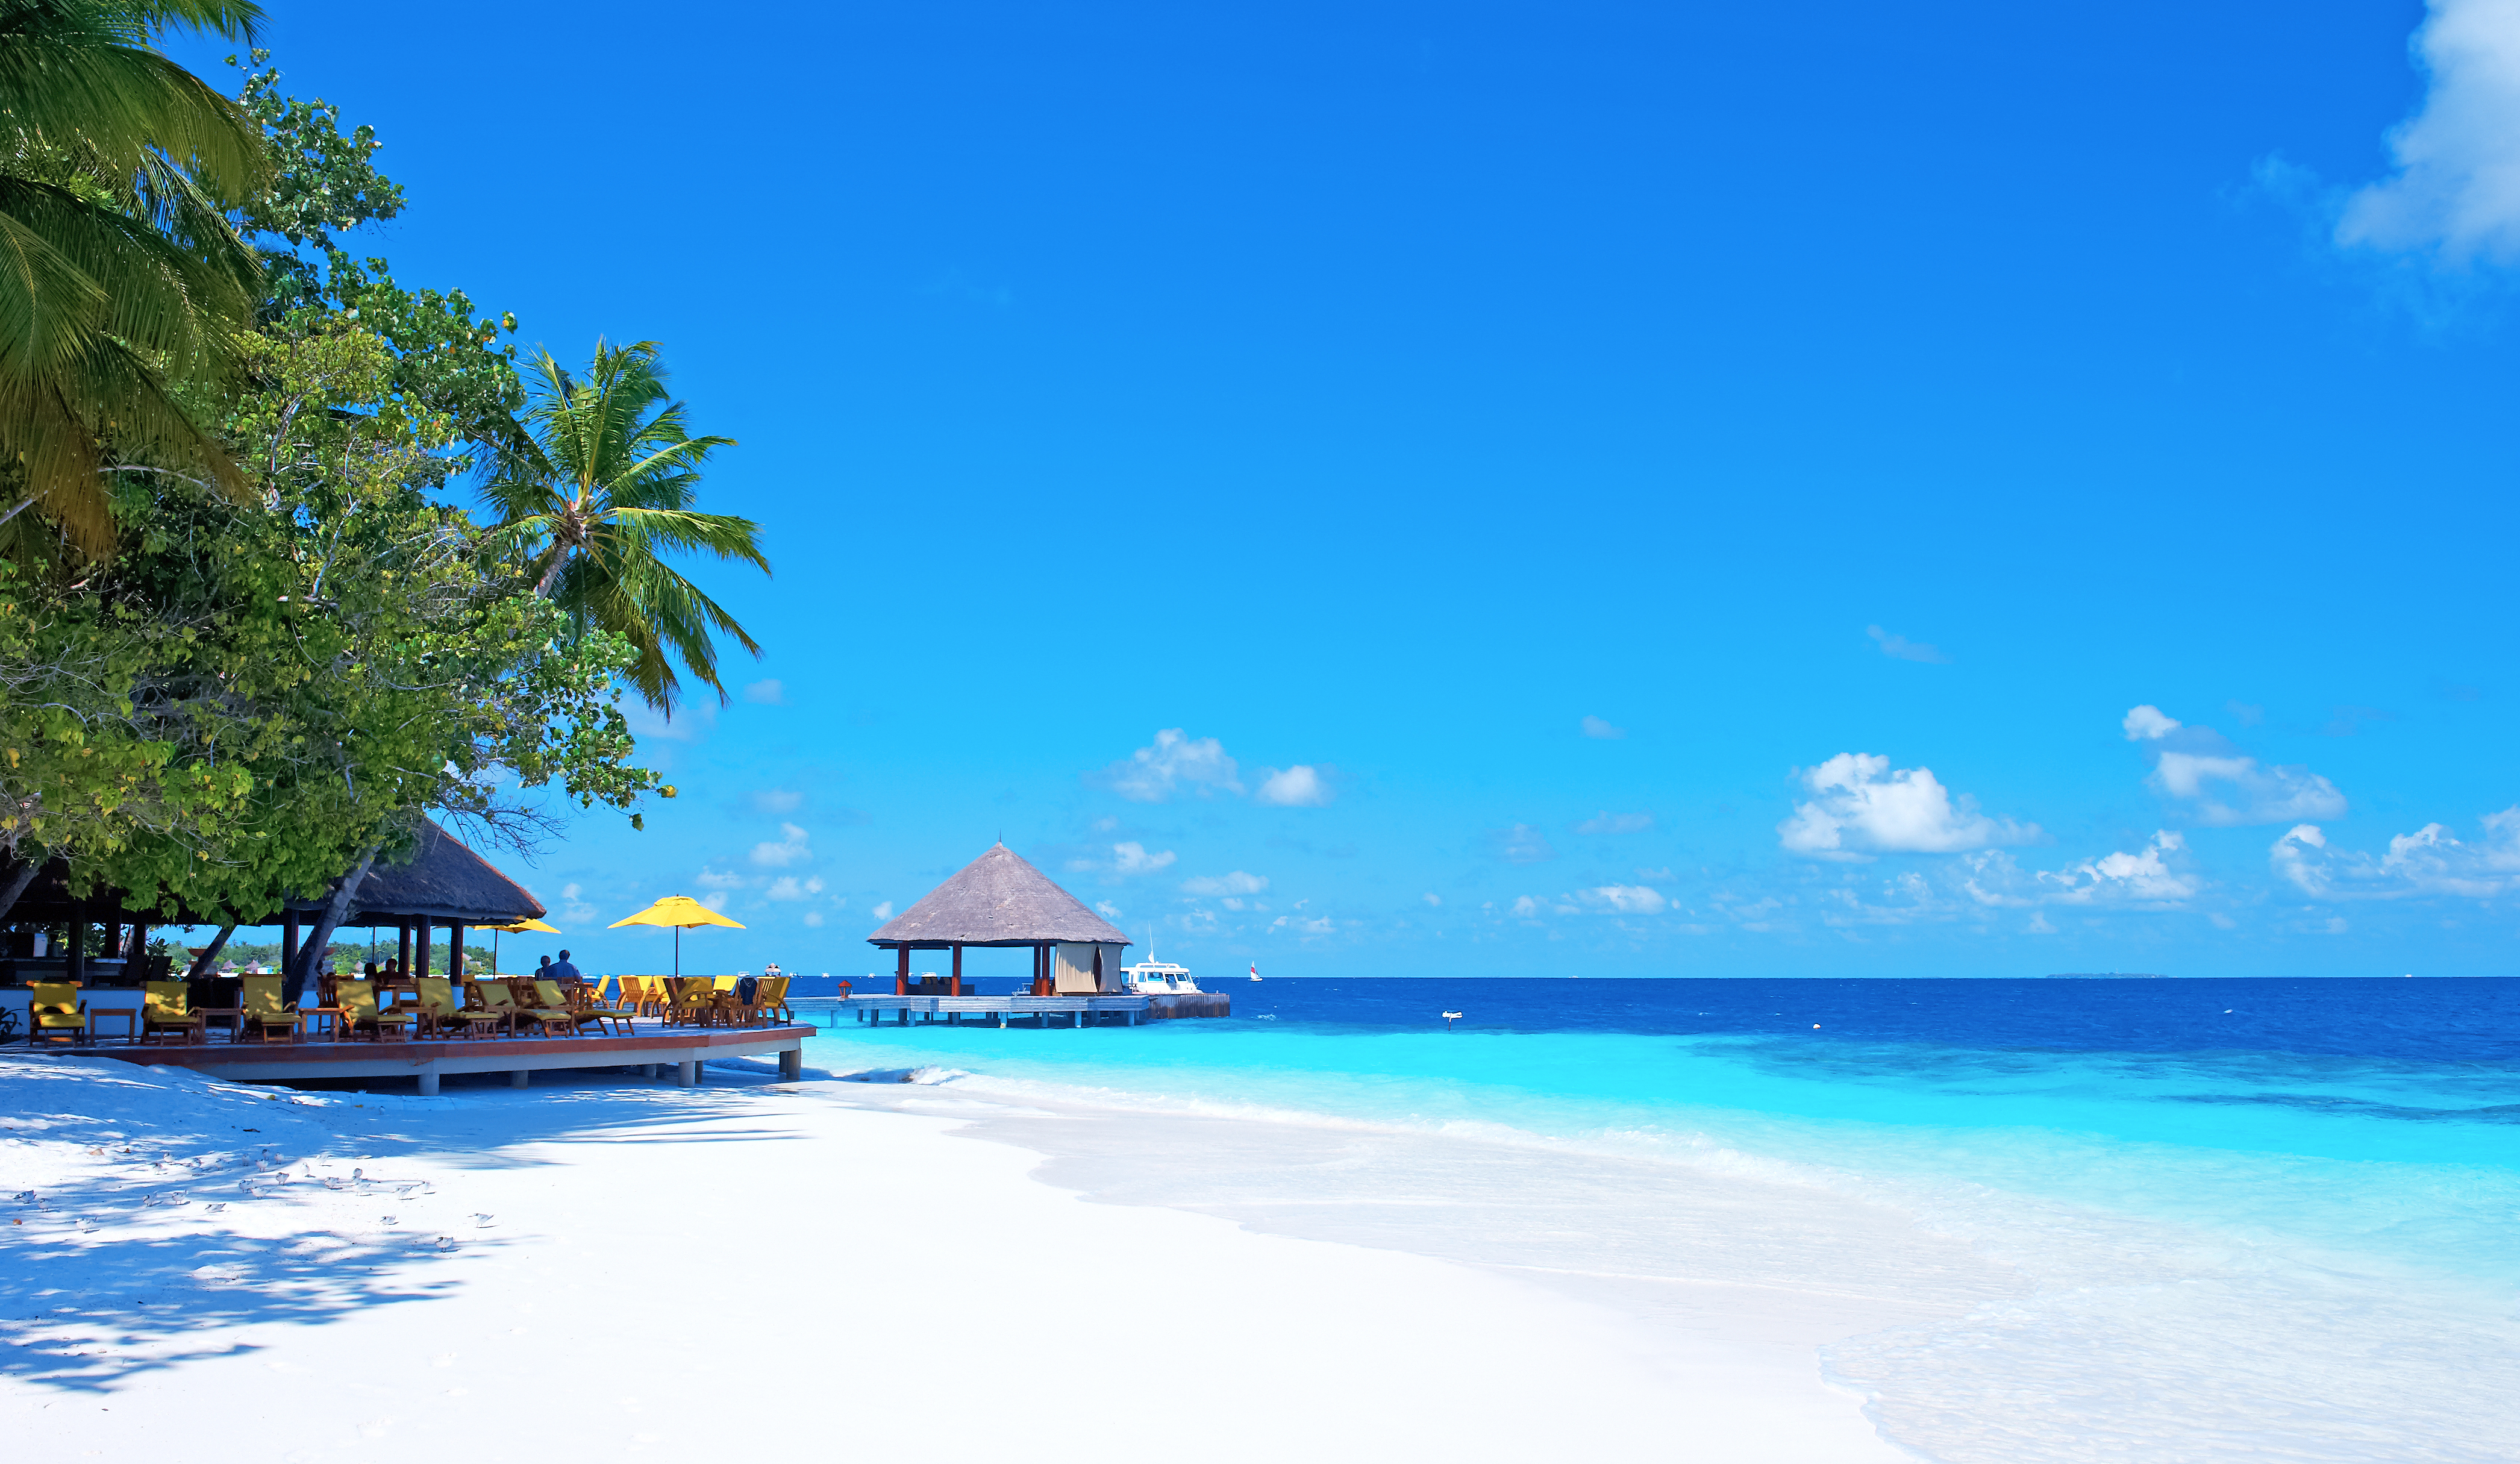 Vabbinfaru Island, Maldives  № 1471556 бесплатно